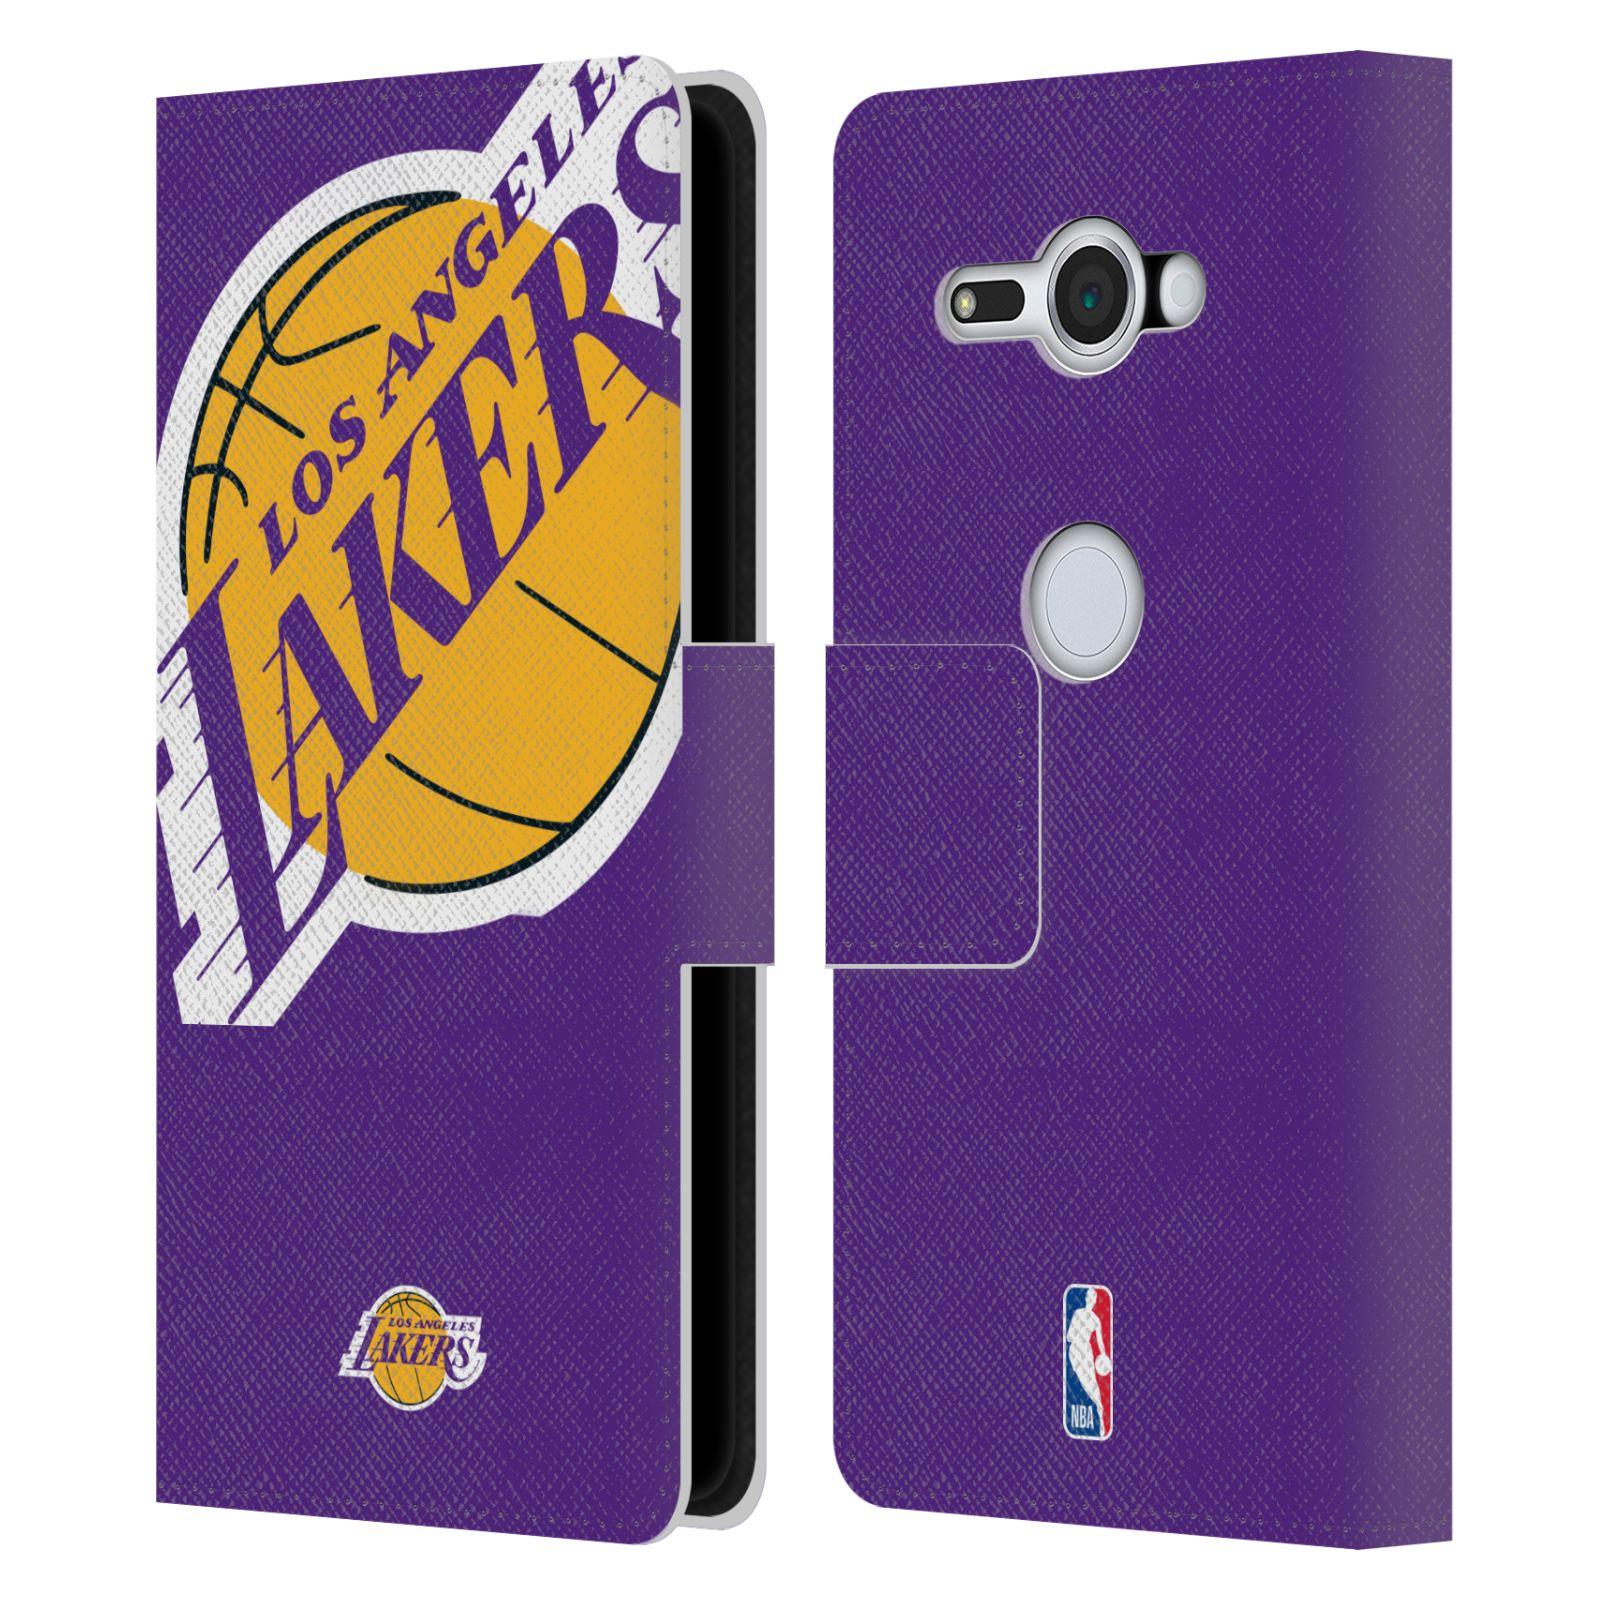 Pouzdro na mobil Sony Xperia XZ2 Compact - Head Case - NBA - Los Angeles Lakers velký znak